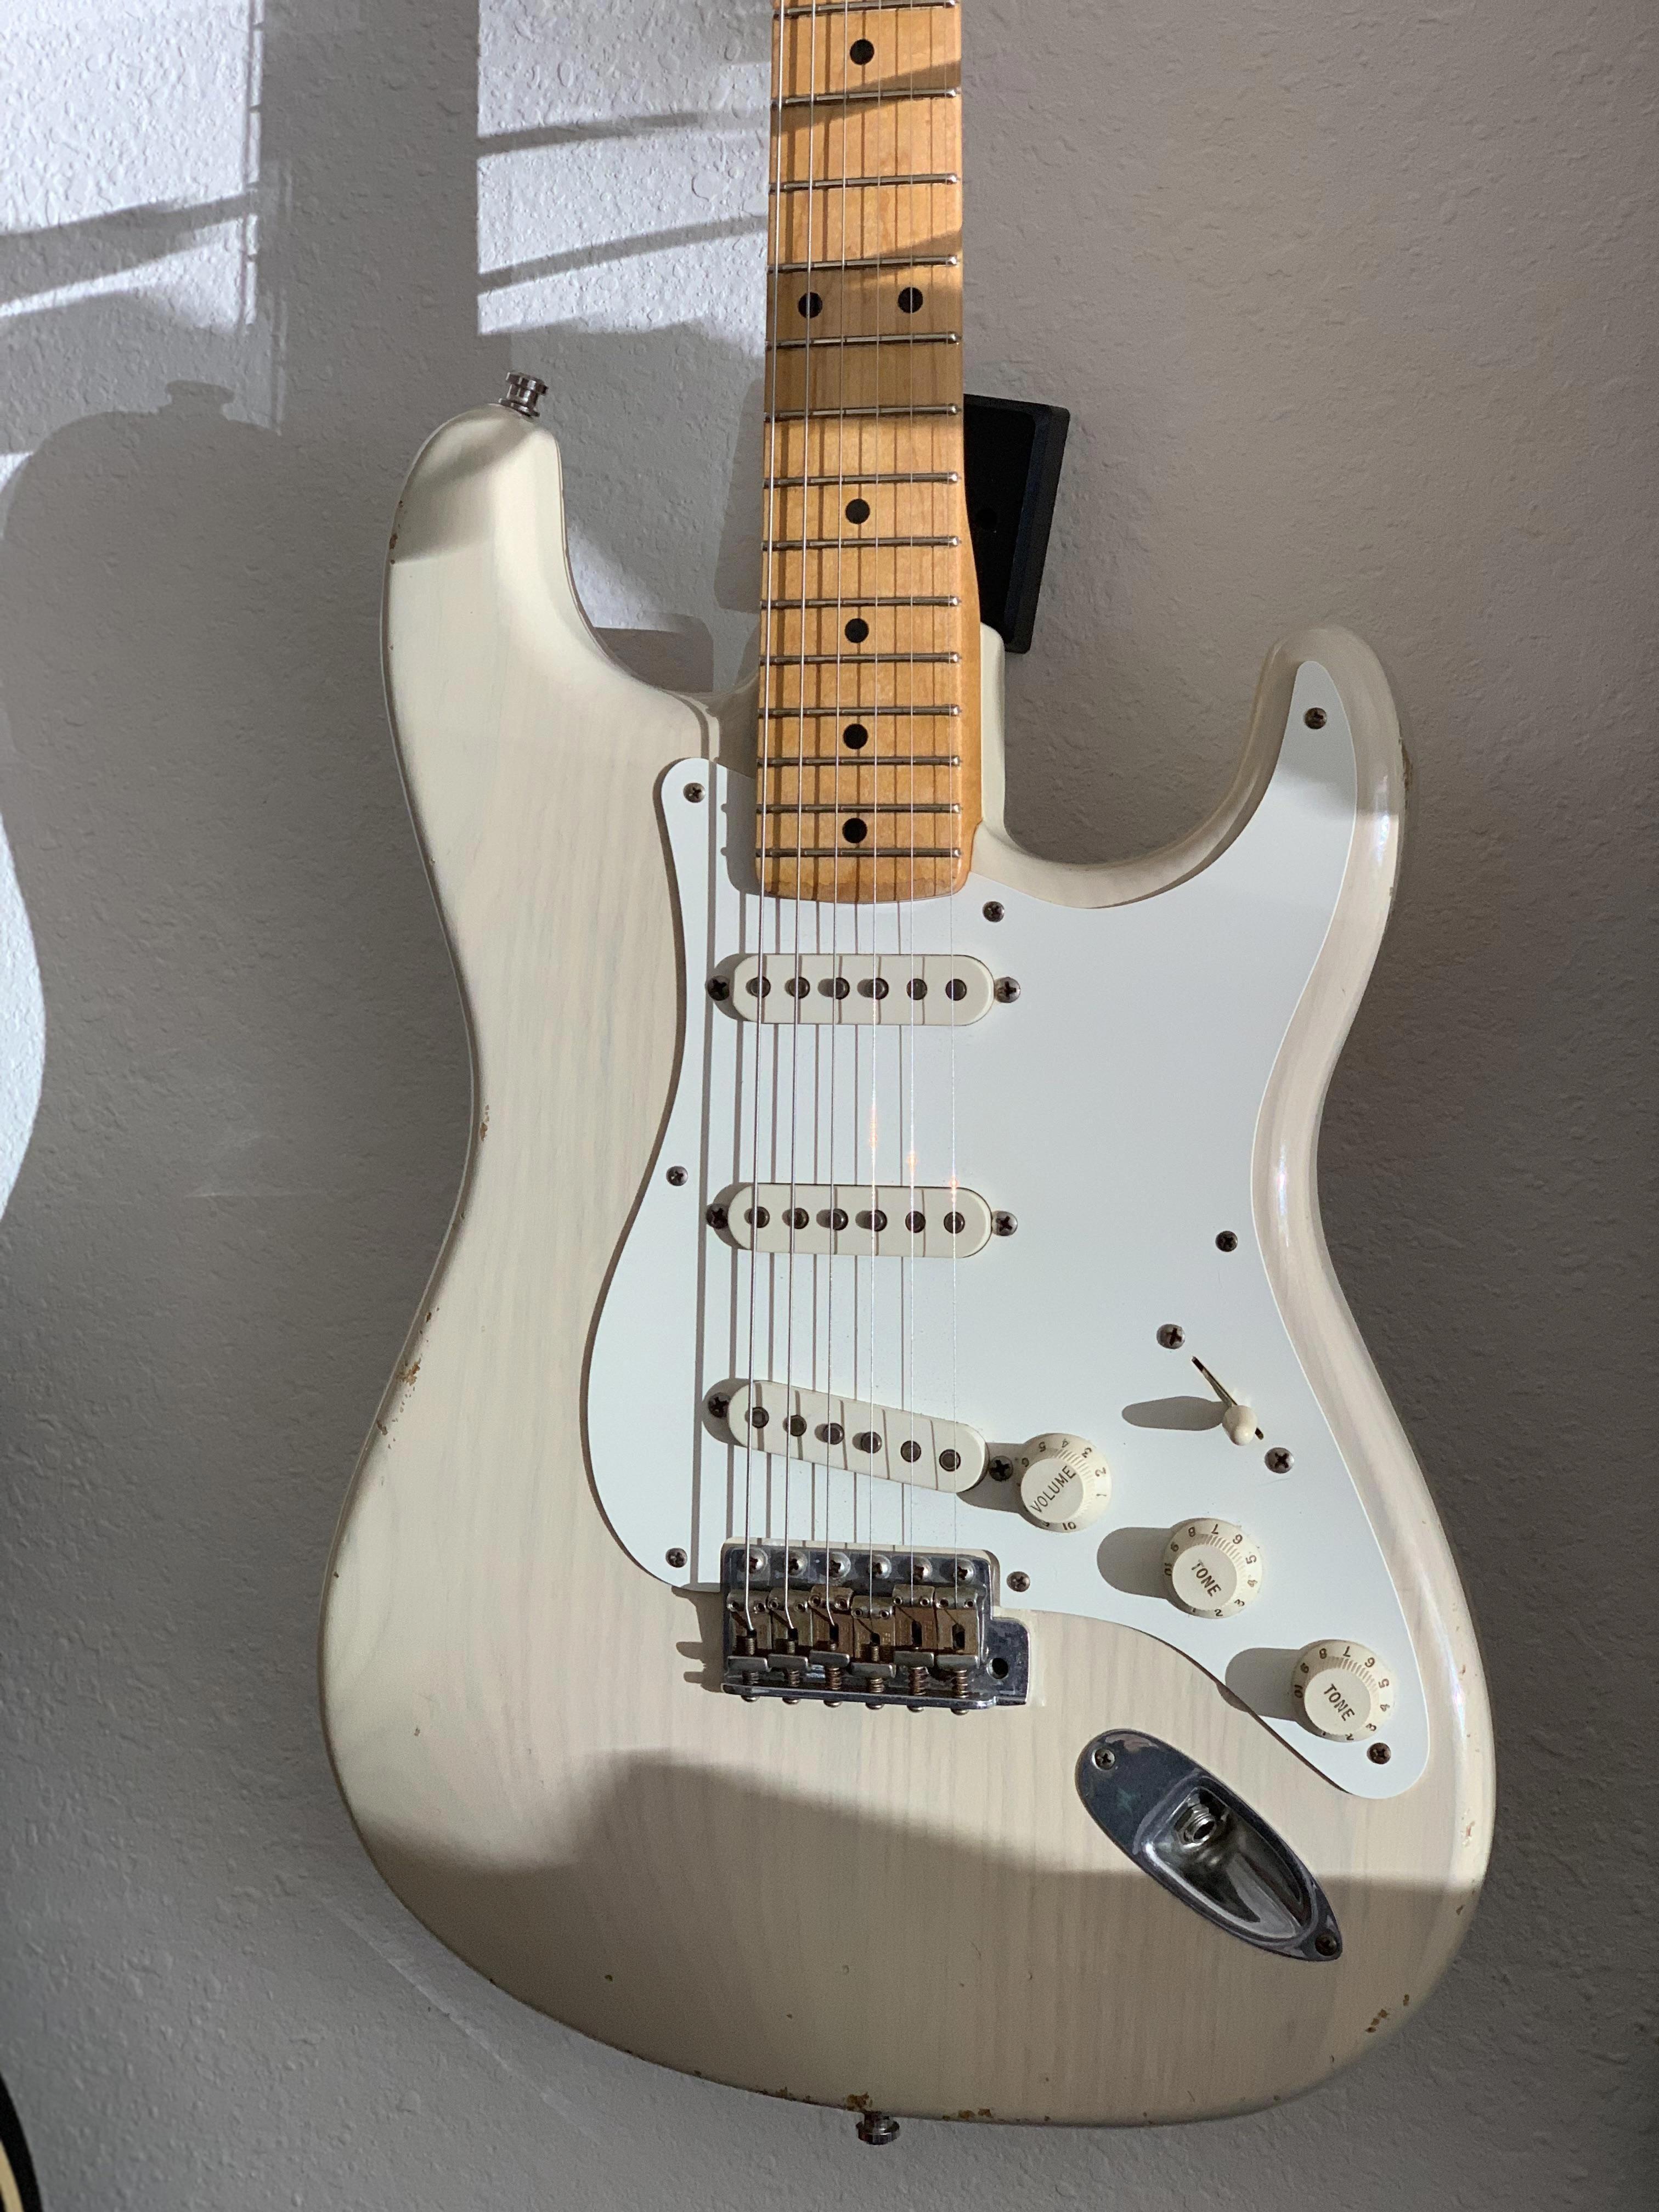 16 Premium Fender Guitar Gifts For Men Fender Guitars T Shirt #guitarteacher #guitarsolo #fenderguitars #fenderguitars